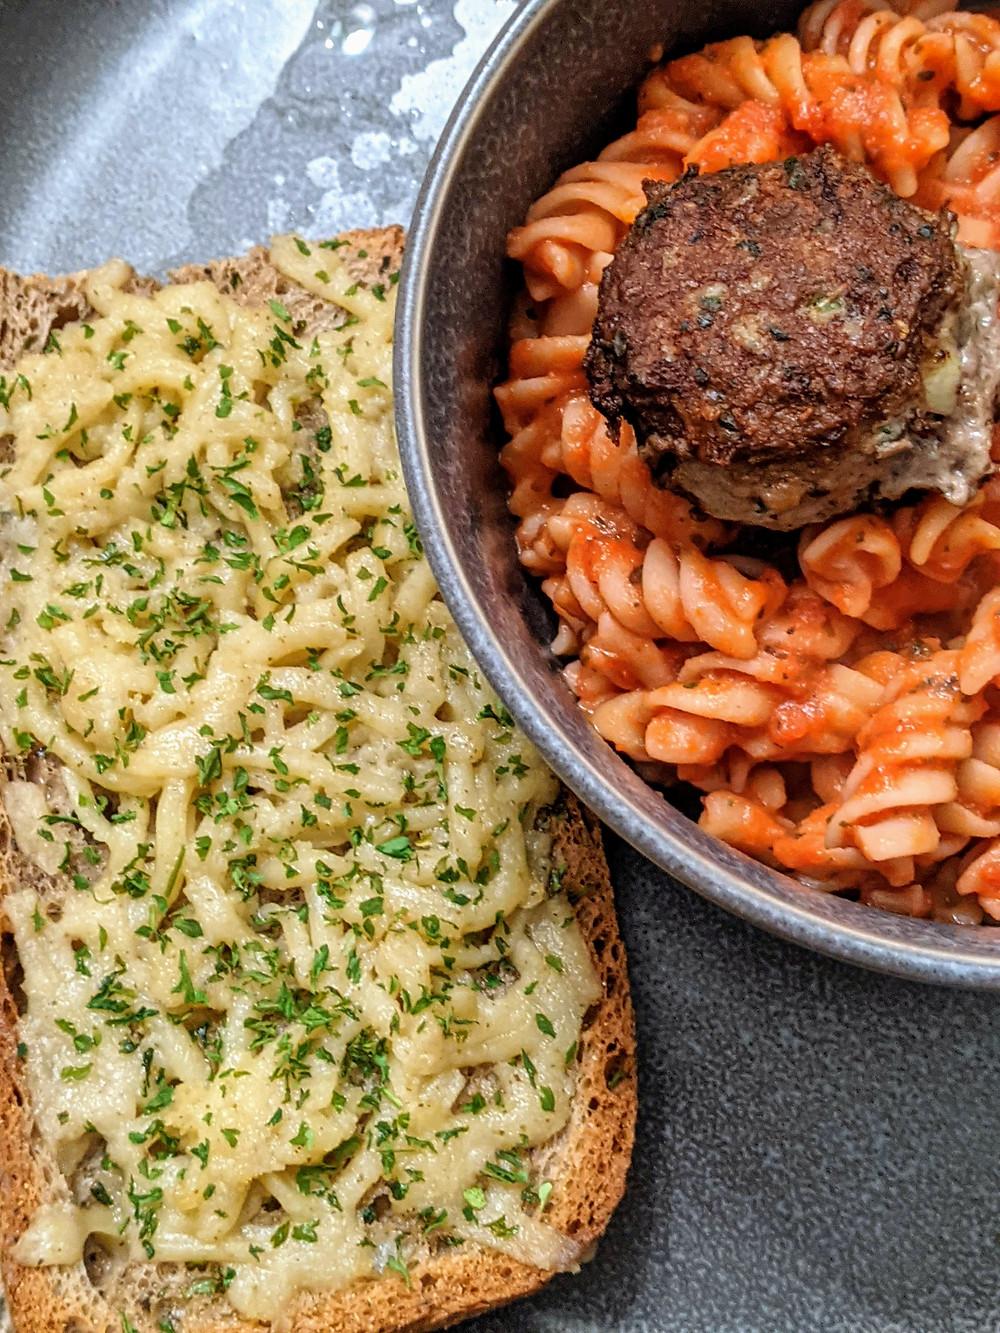 The Sunday Cookbook  - Tomato-Free Marinara Sauce - nightshade free - joseph centineo - amanda macgregor - food allergy recipes